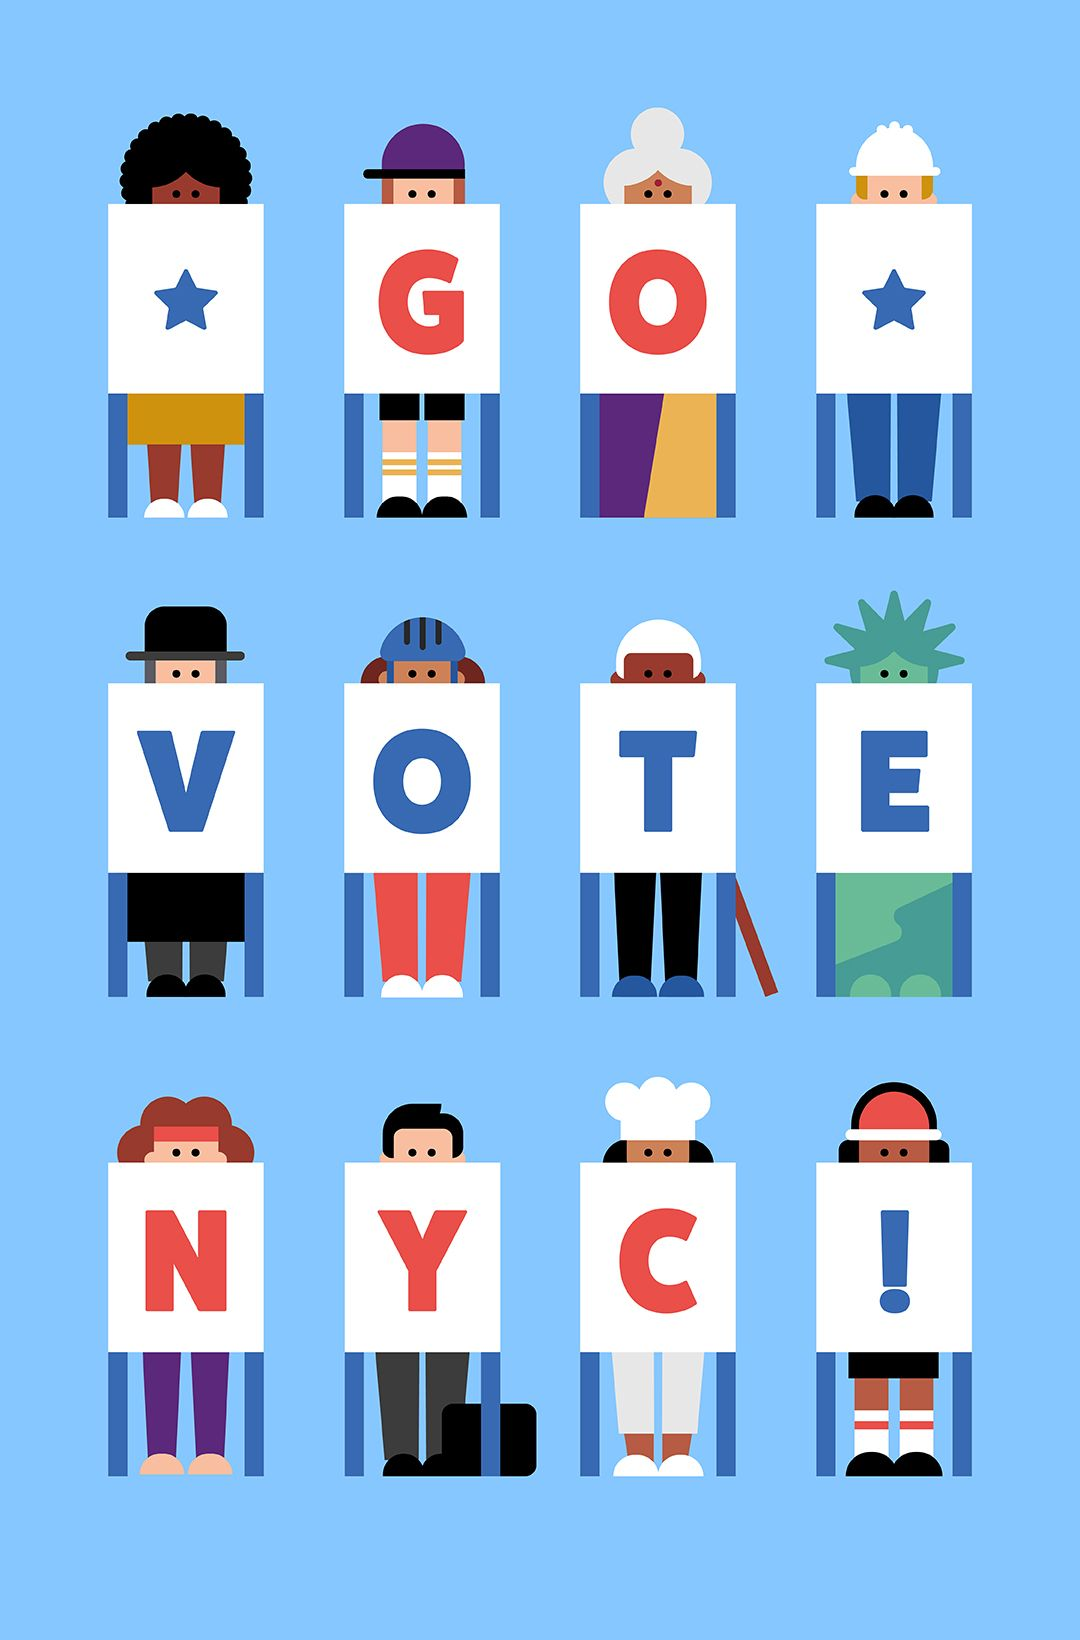 garance-illustration-Link_Vote_gzoavo01_web